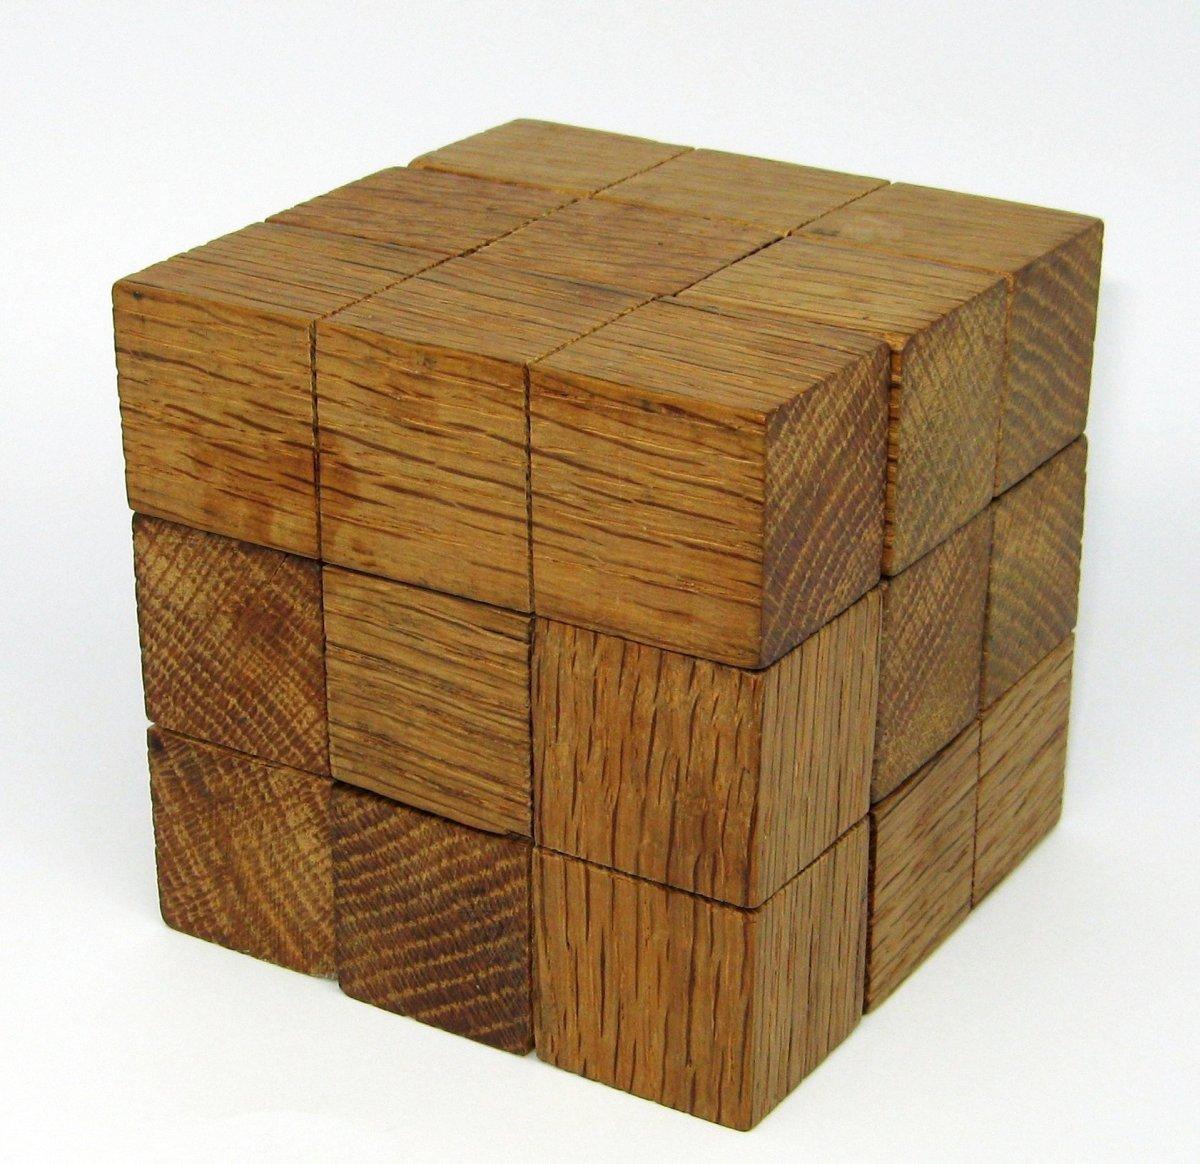 Make a Wooden Soma Cube